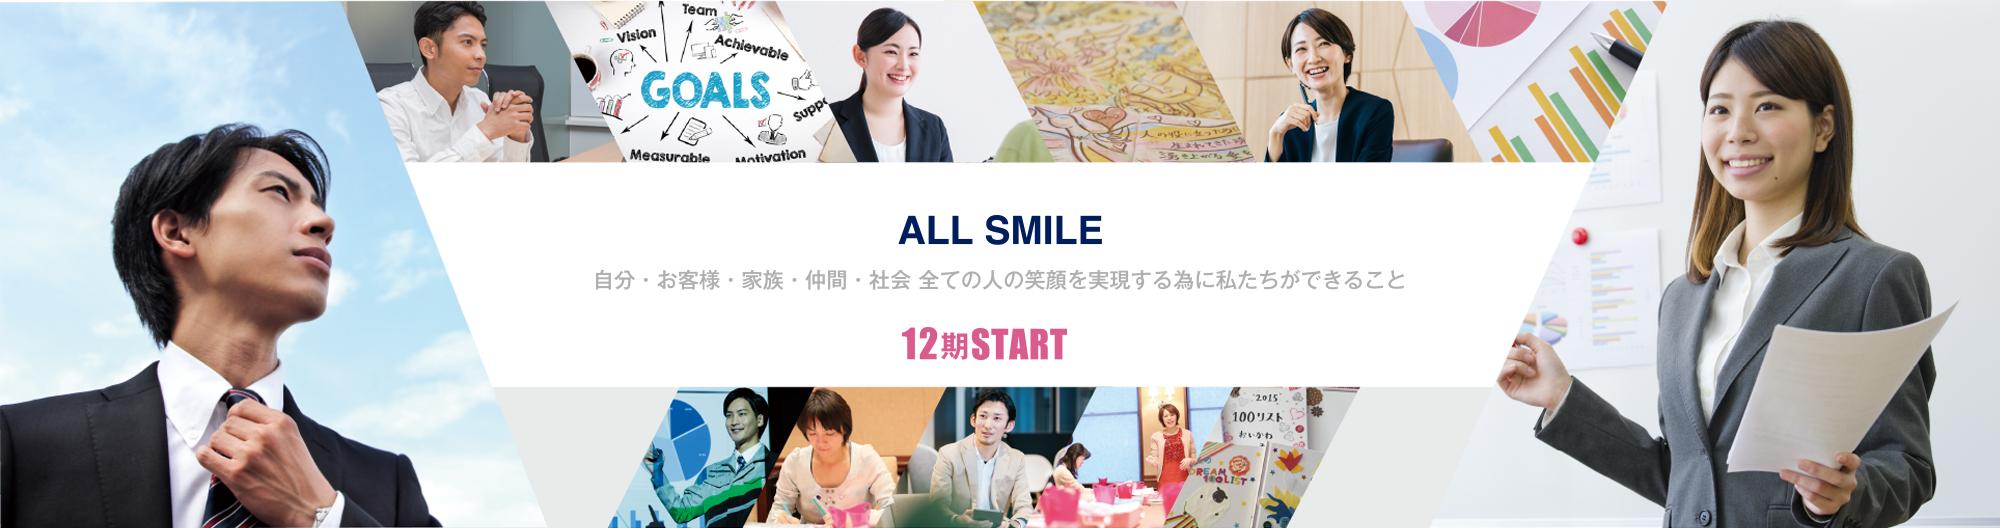 ALL SMILE 自分・お客様・家族・仲間・社会 全ての人の笑顔を実現する為に私たちができること